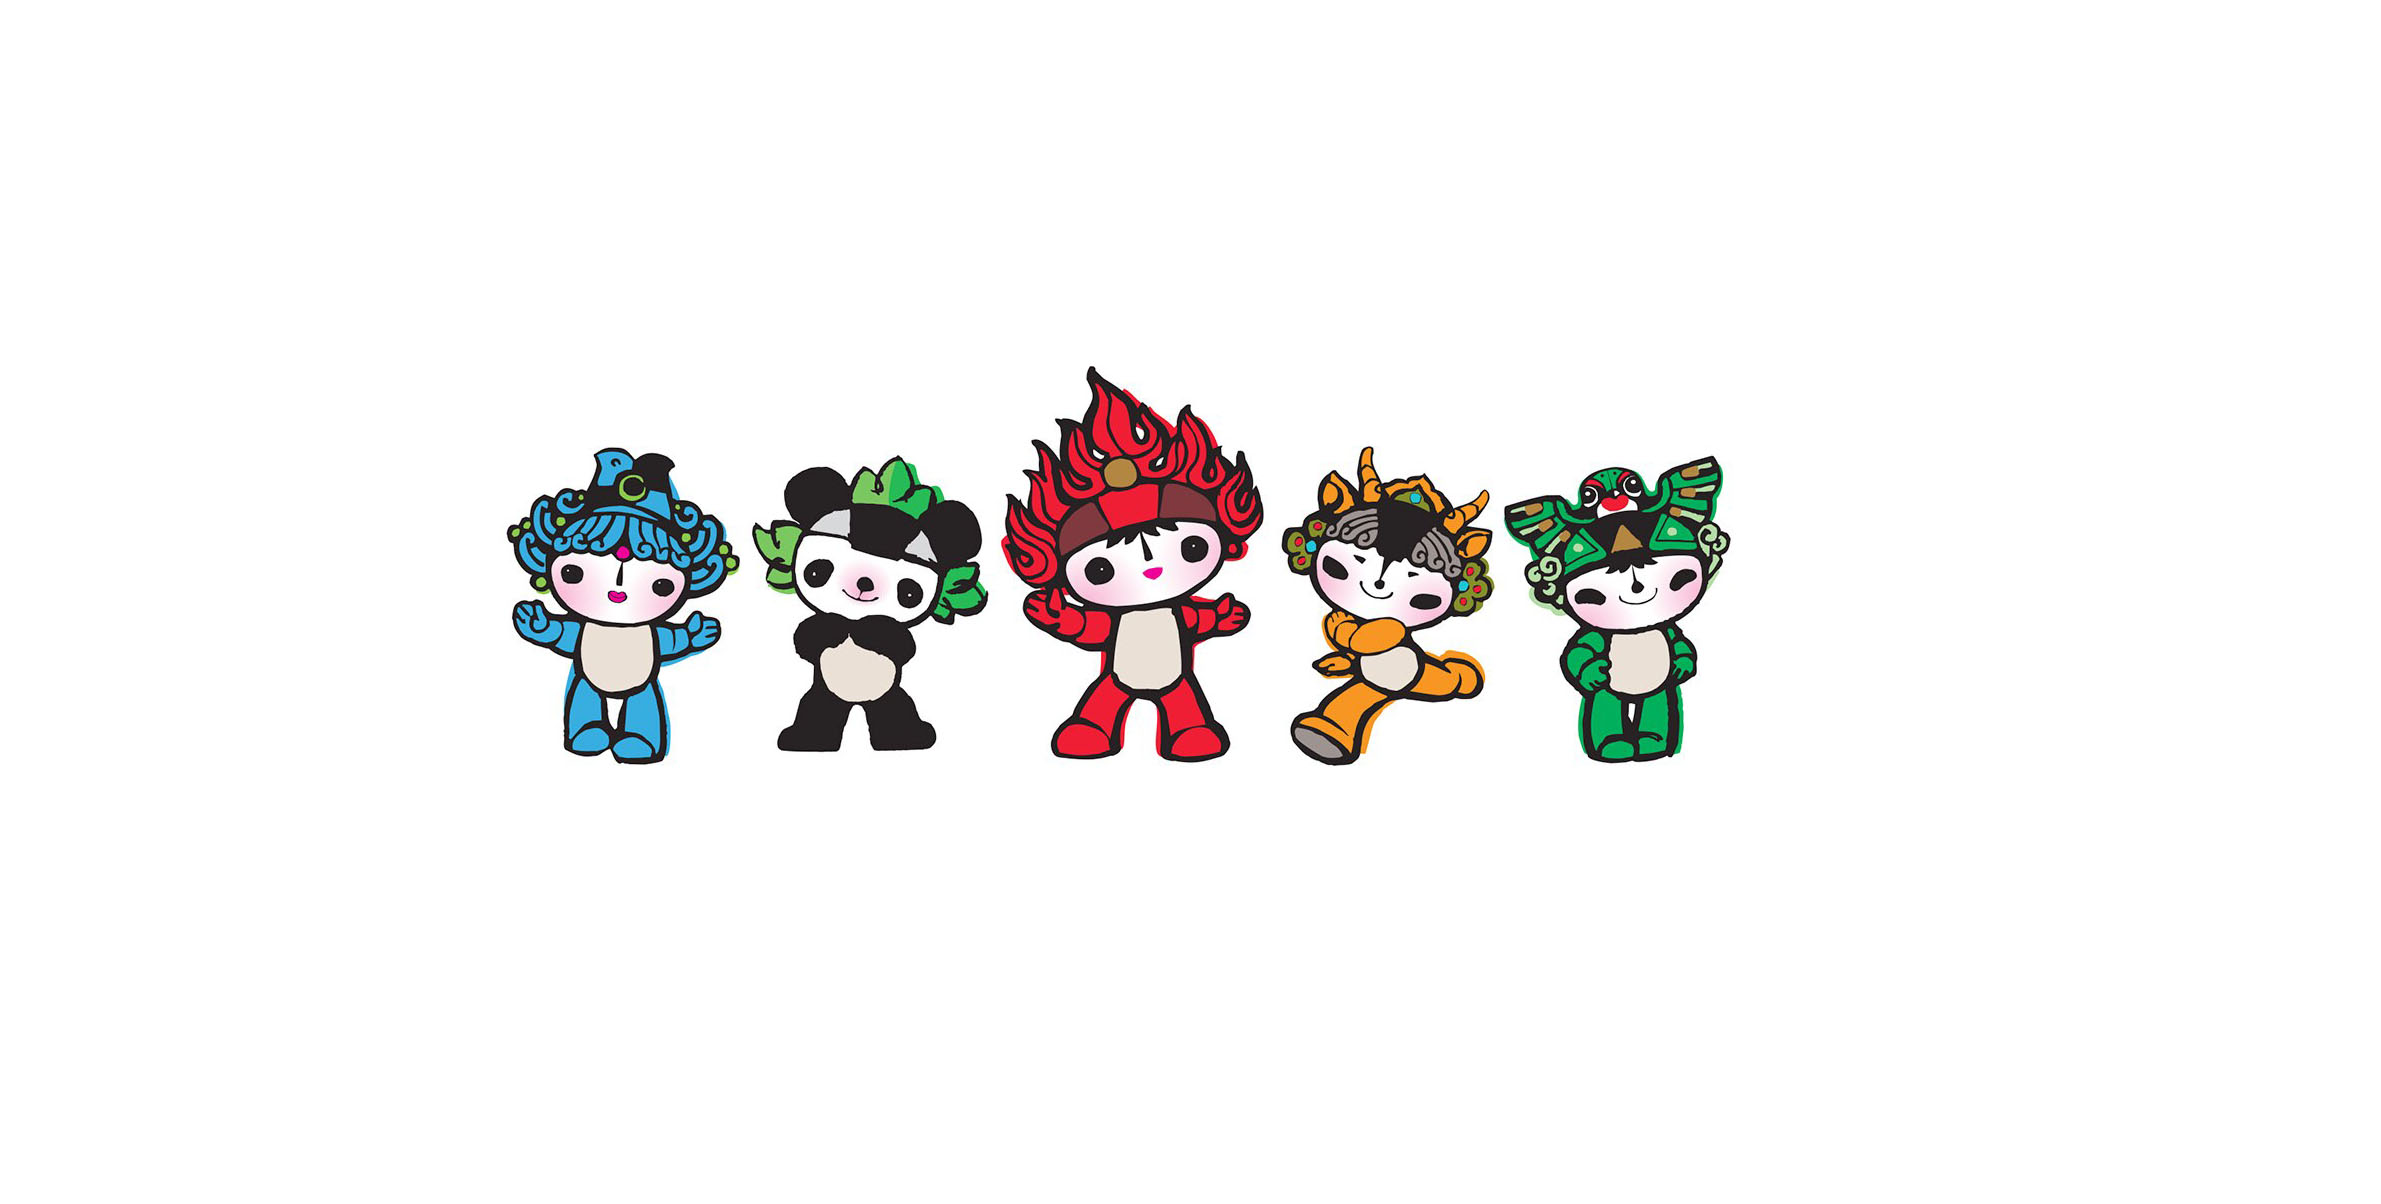 Mascote da Olimpíada de Pequim 2008